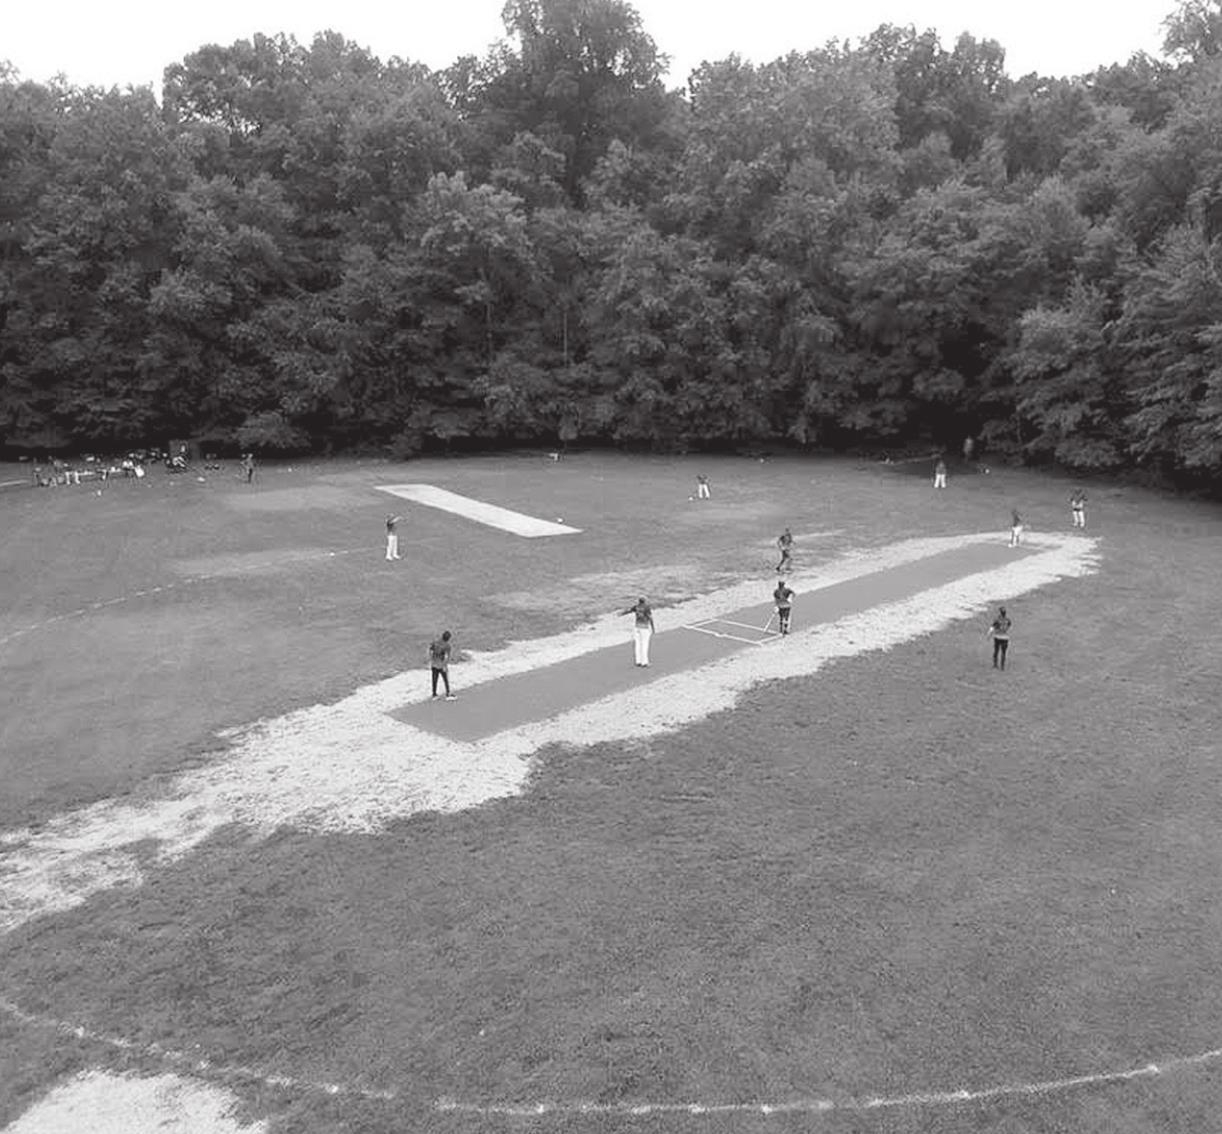 Sanskriti League Opens New Cricket Pitch